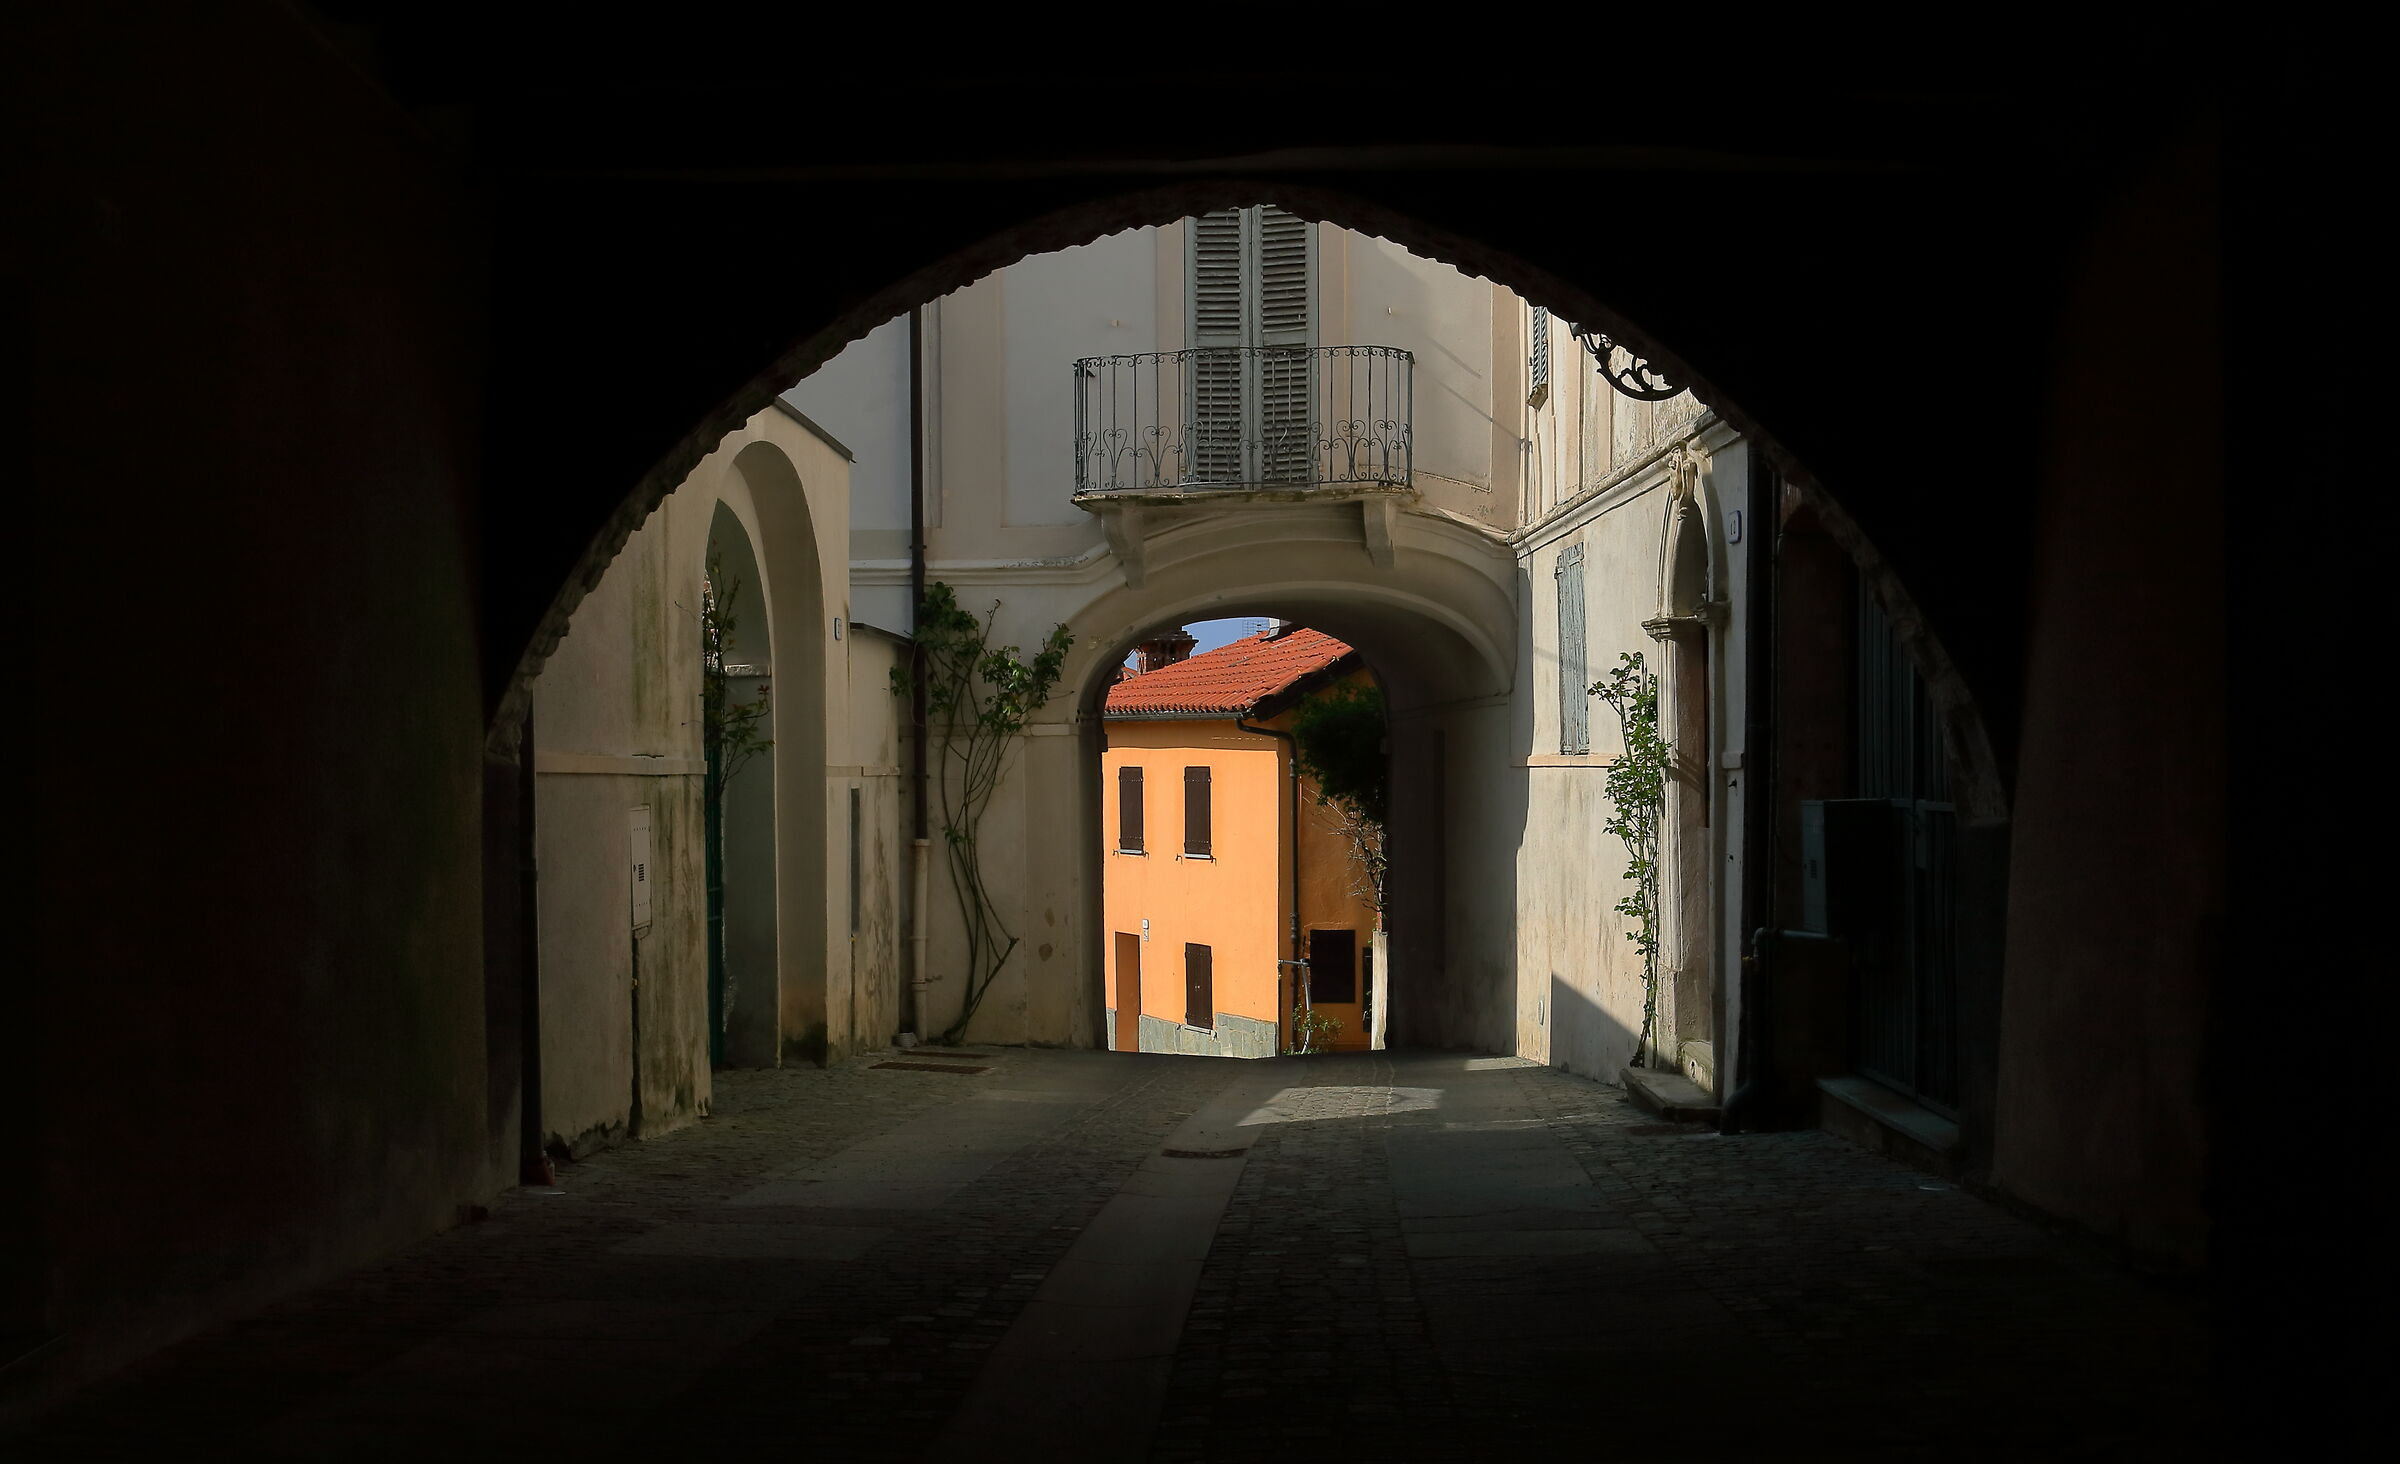 Through the streets of Bossolasco (CN)...